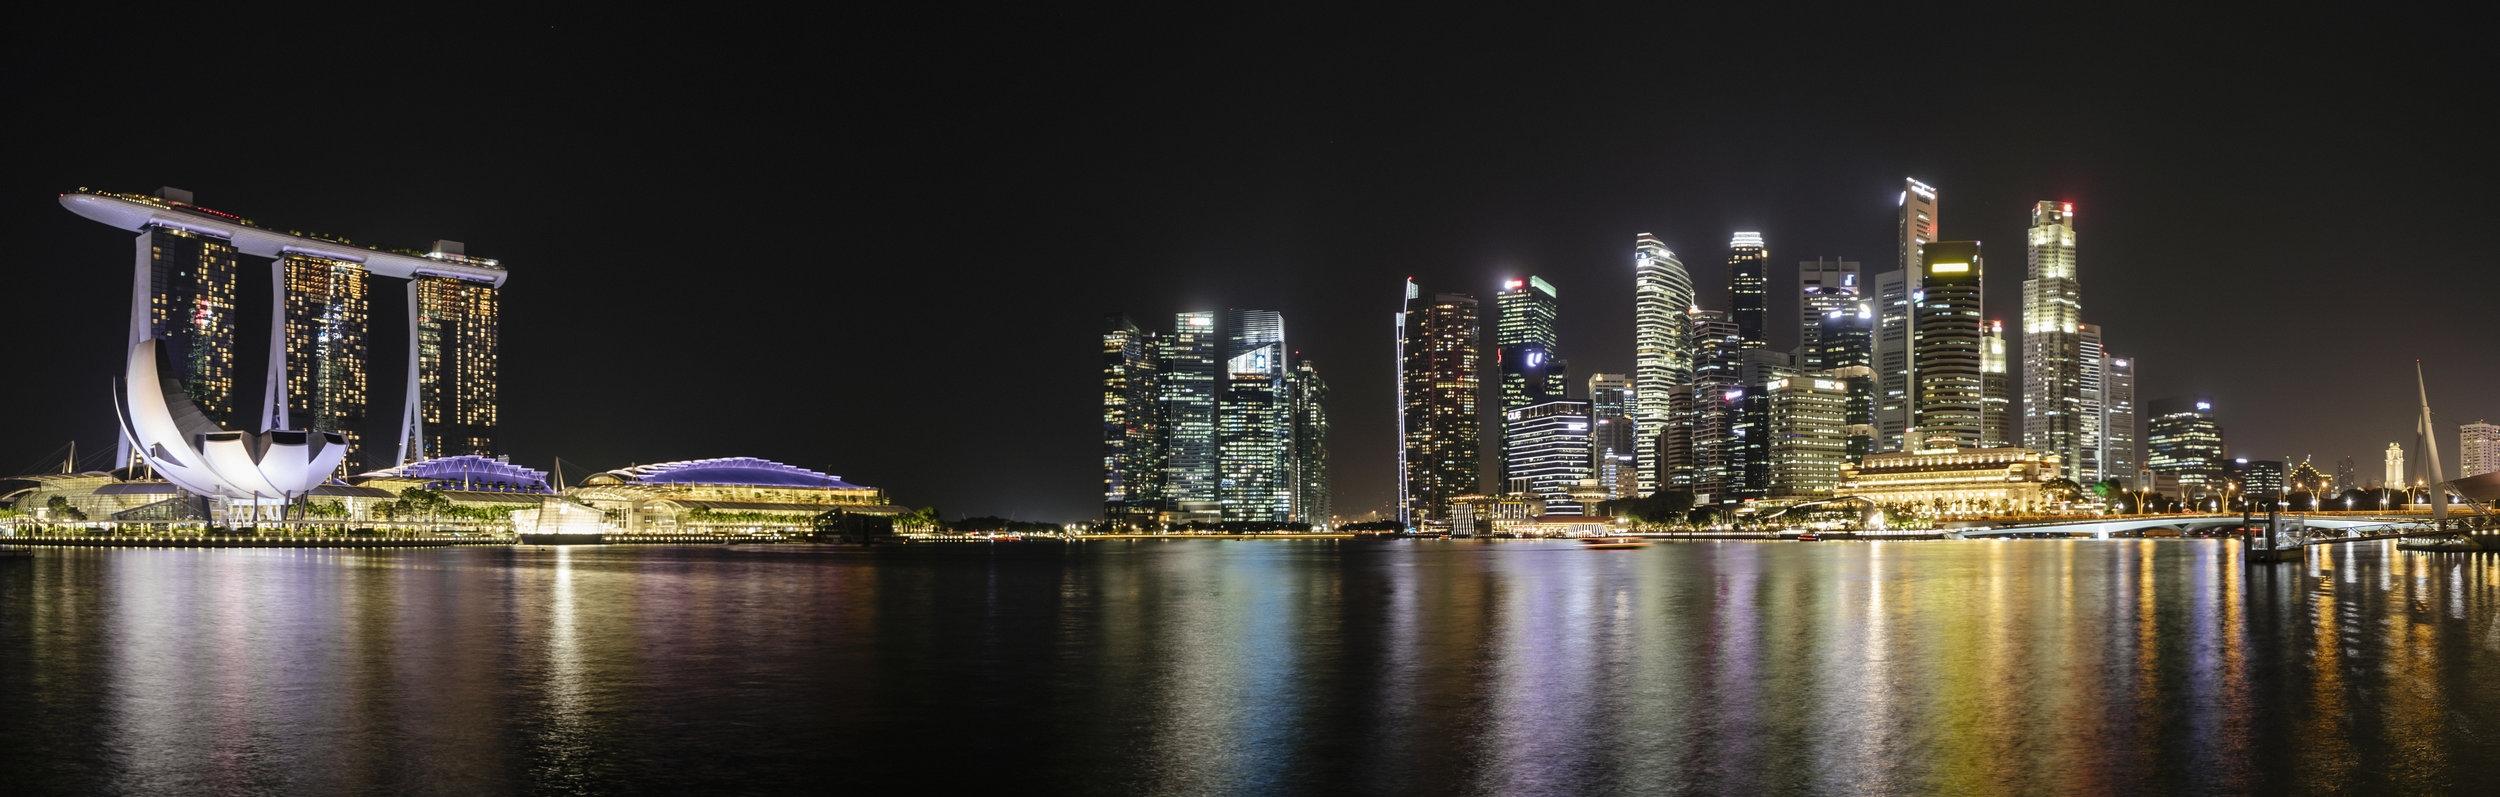 Canon 5Ds + Samyang AF 14mm f/2.8 EF (3 image panorama stitch)